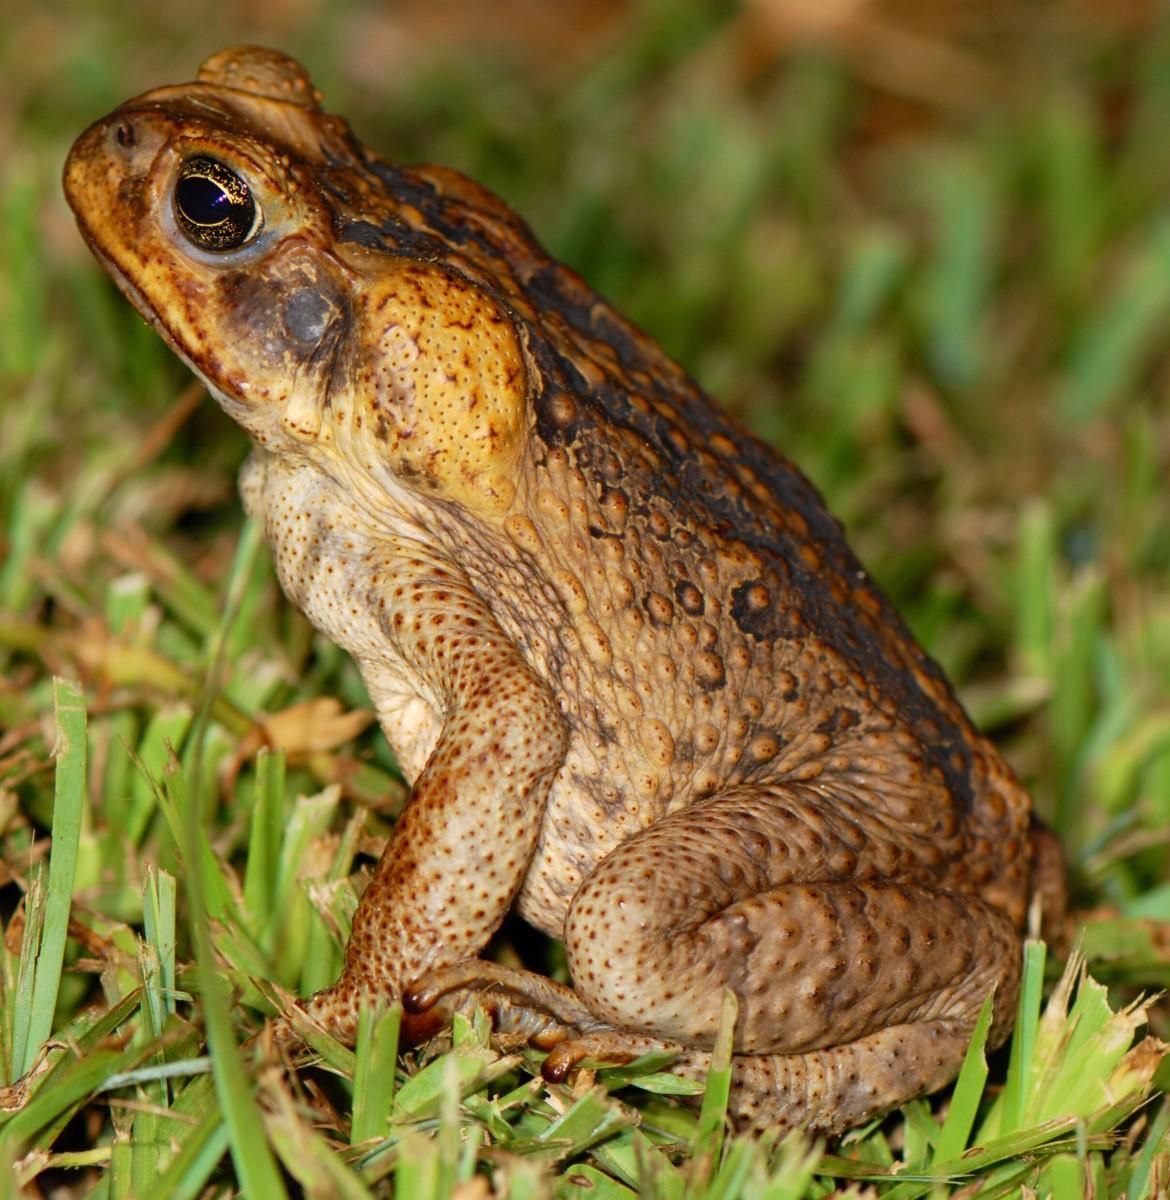 A cane toad, or Bufo marinus